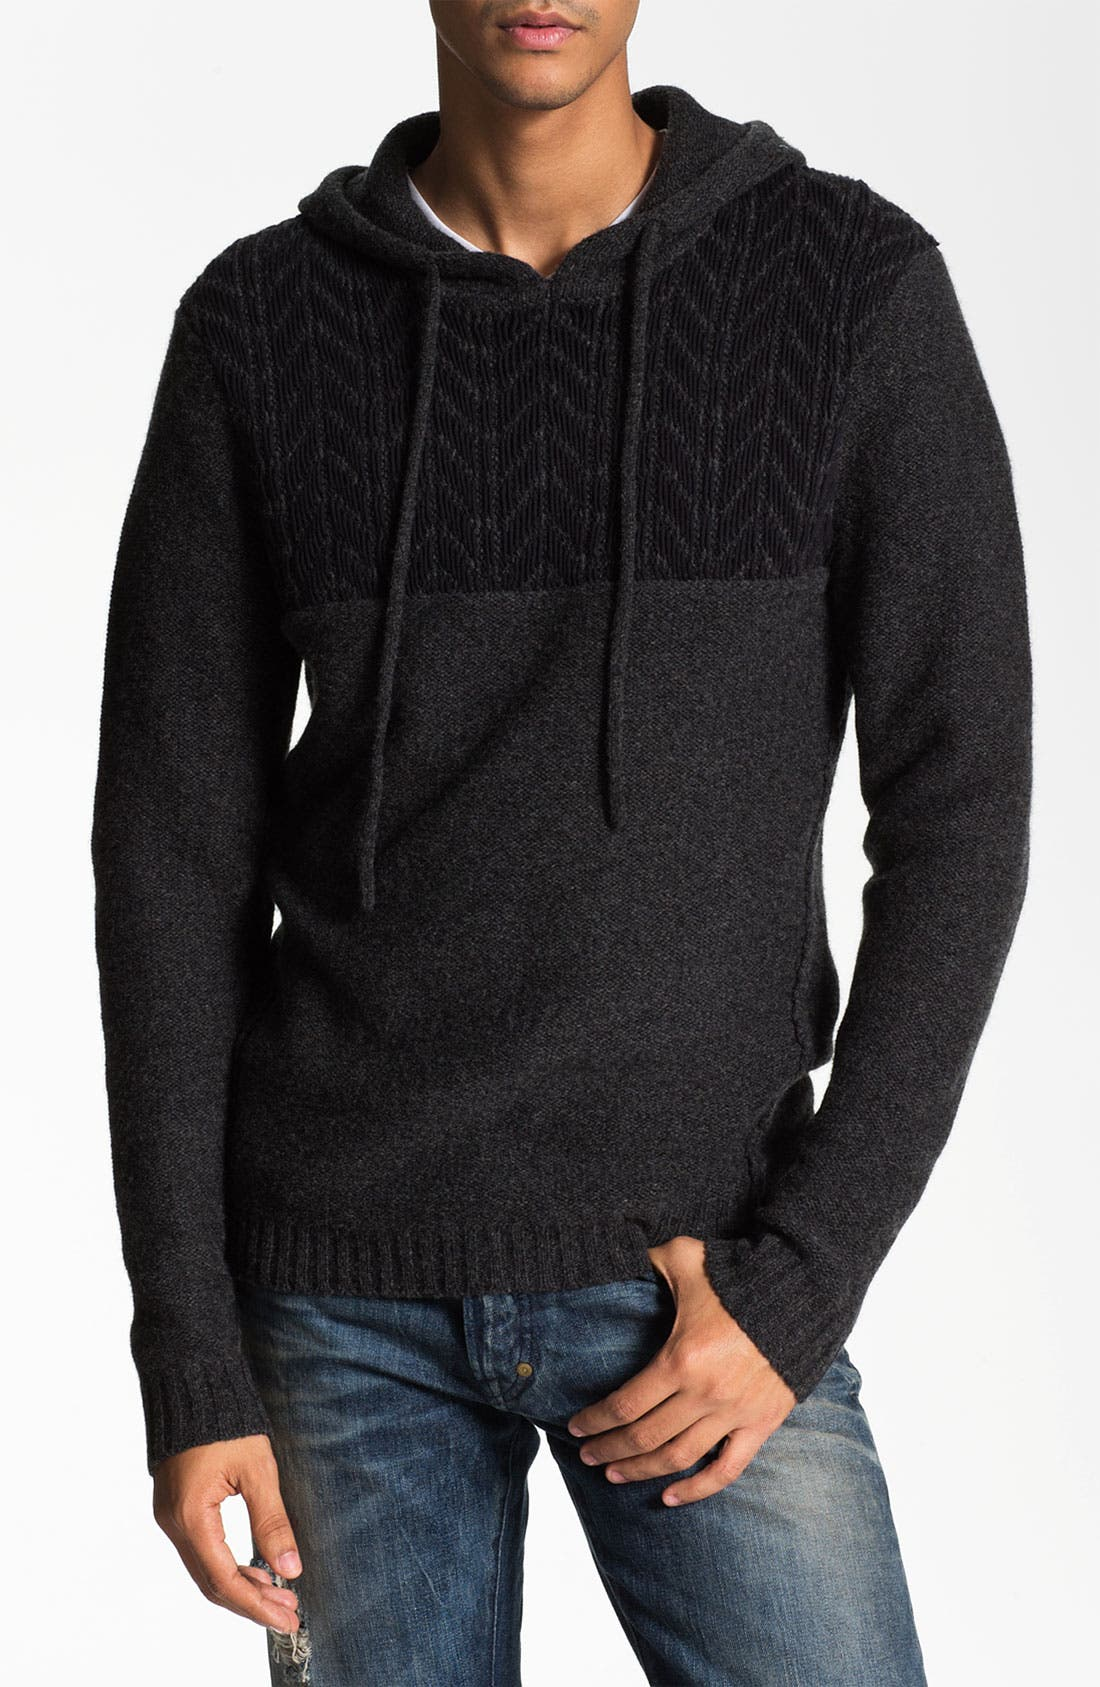 Alternate Image 1 Selected - Edun 'GG' Hooded Sweater